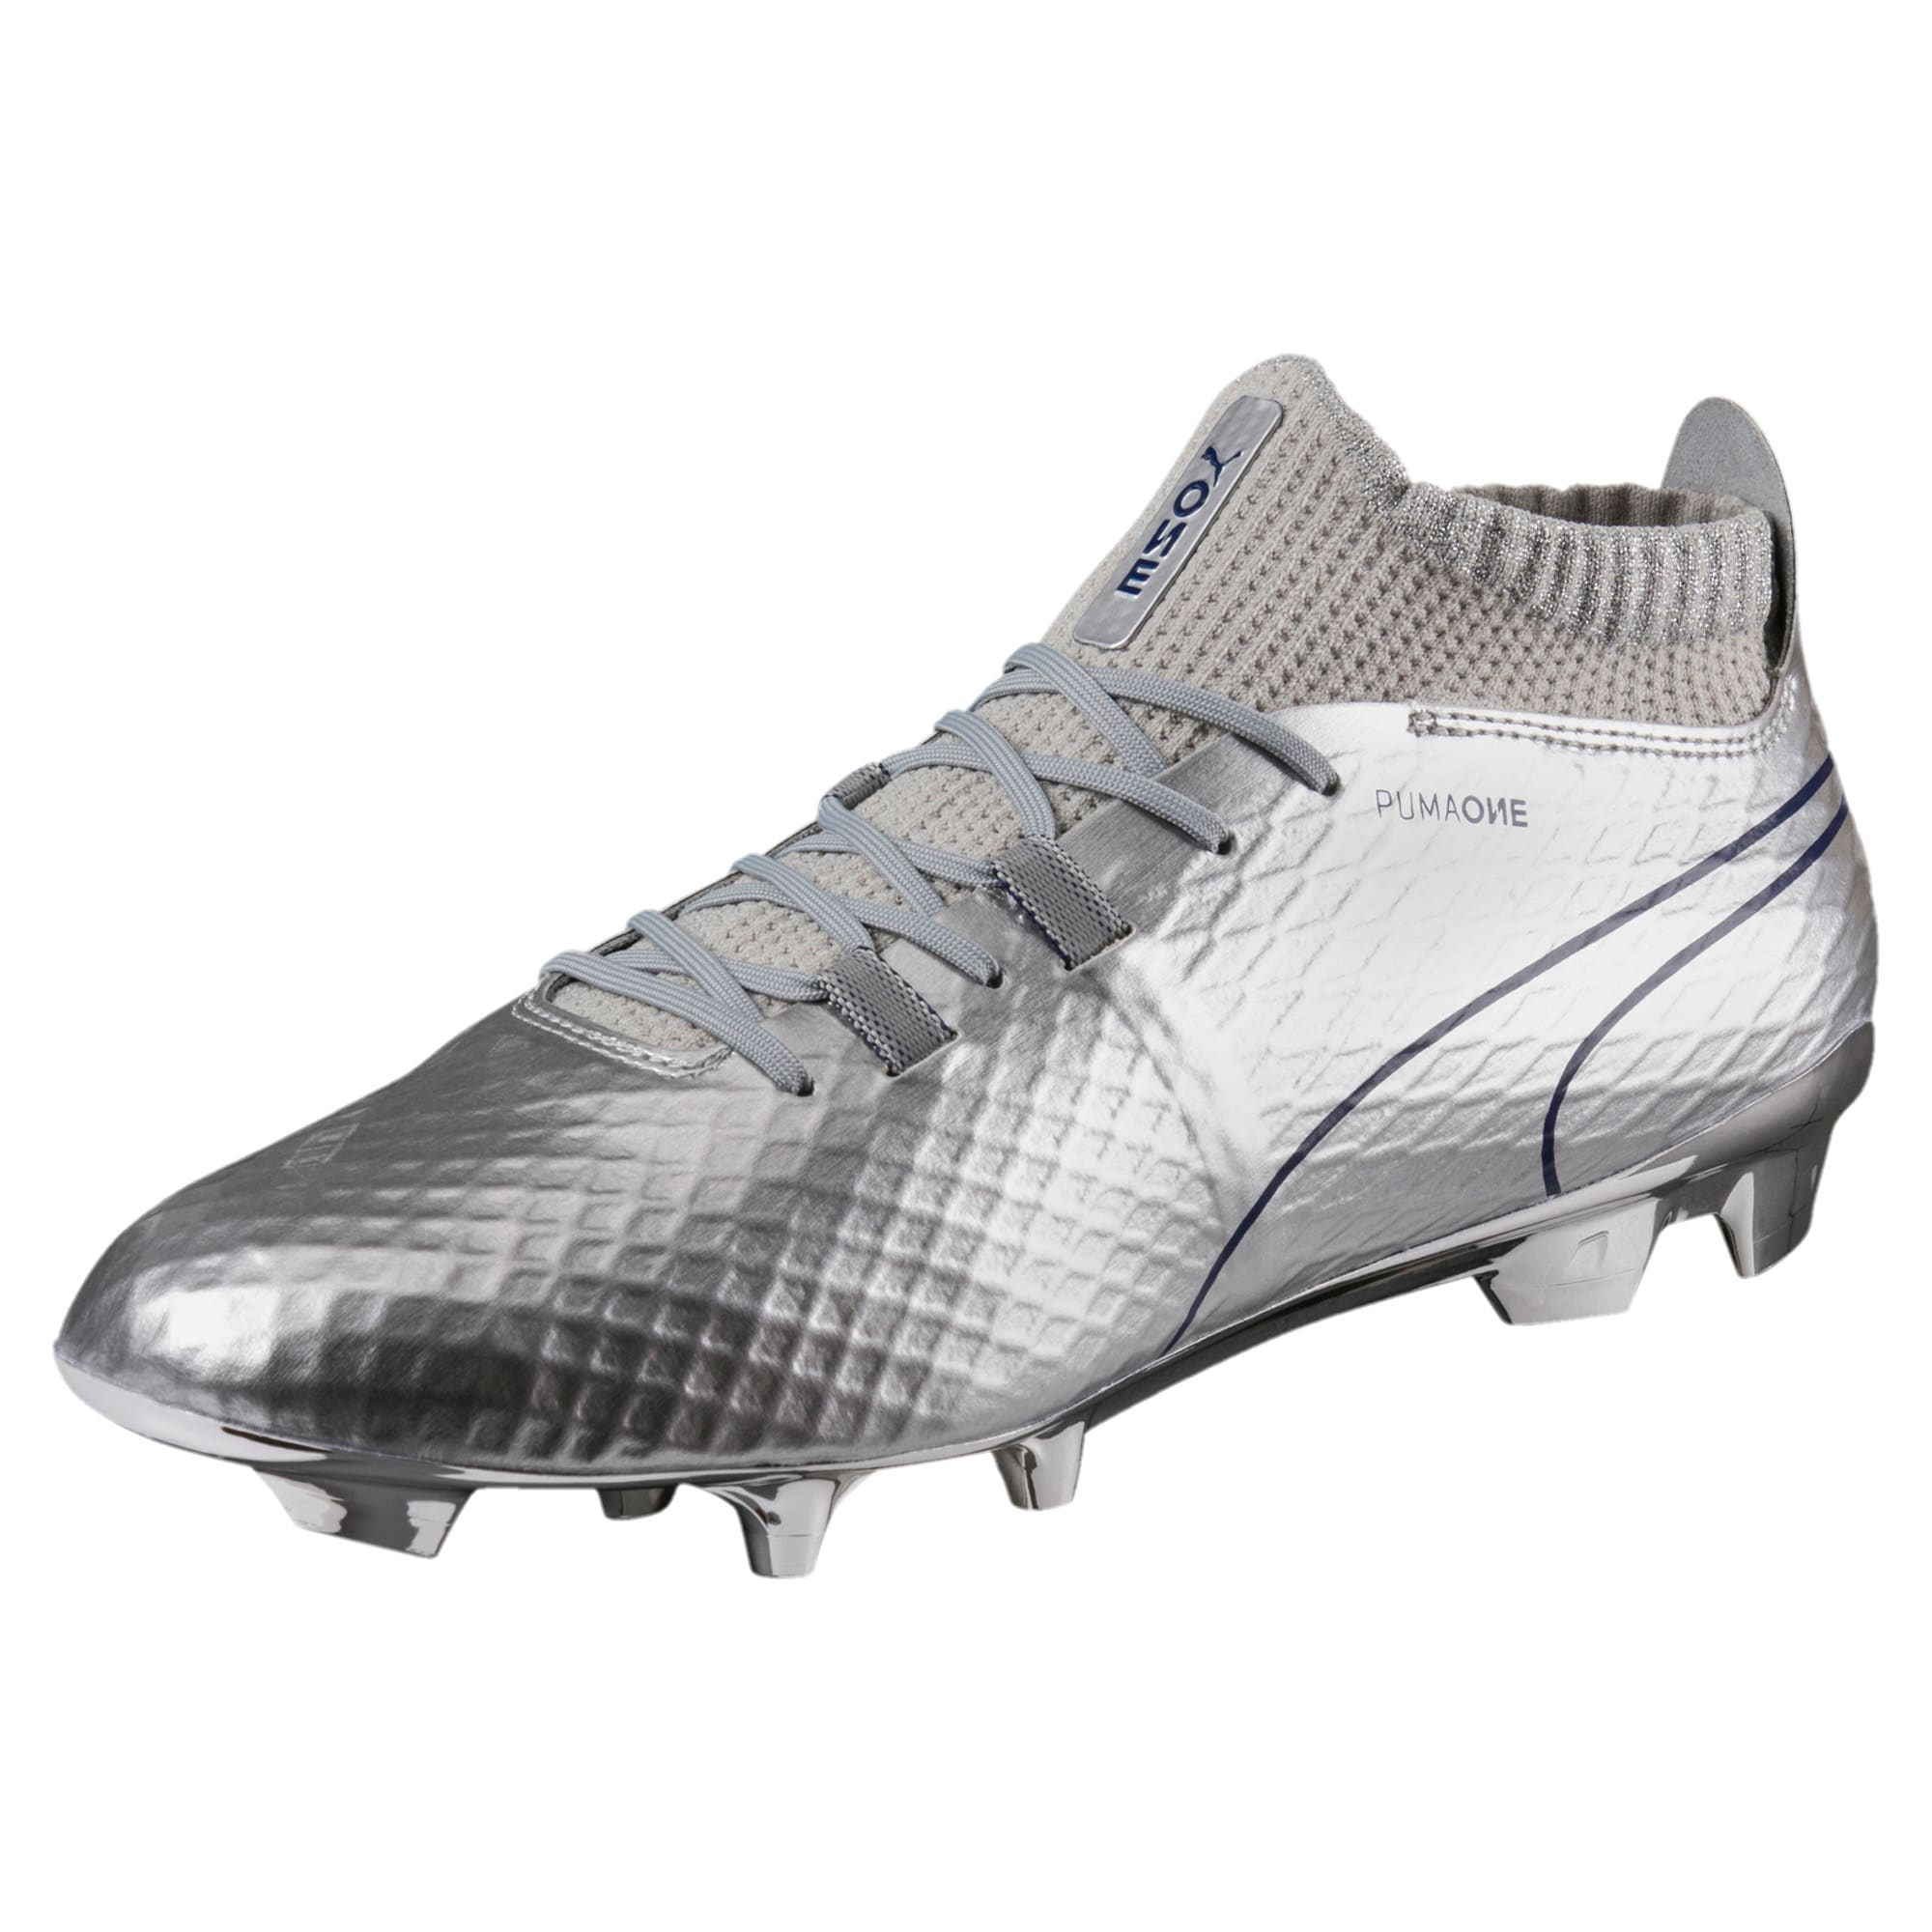 Thumbnail 1 of PUMA ONE Chrome FG Men's Soccer Cleats, Silver-Blue Depths, medium